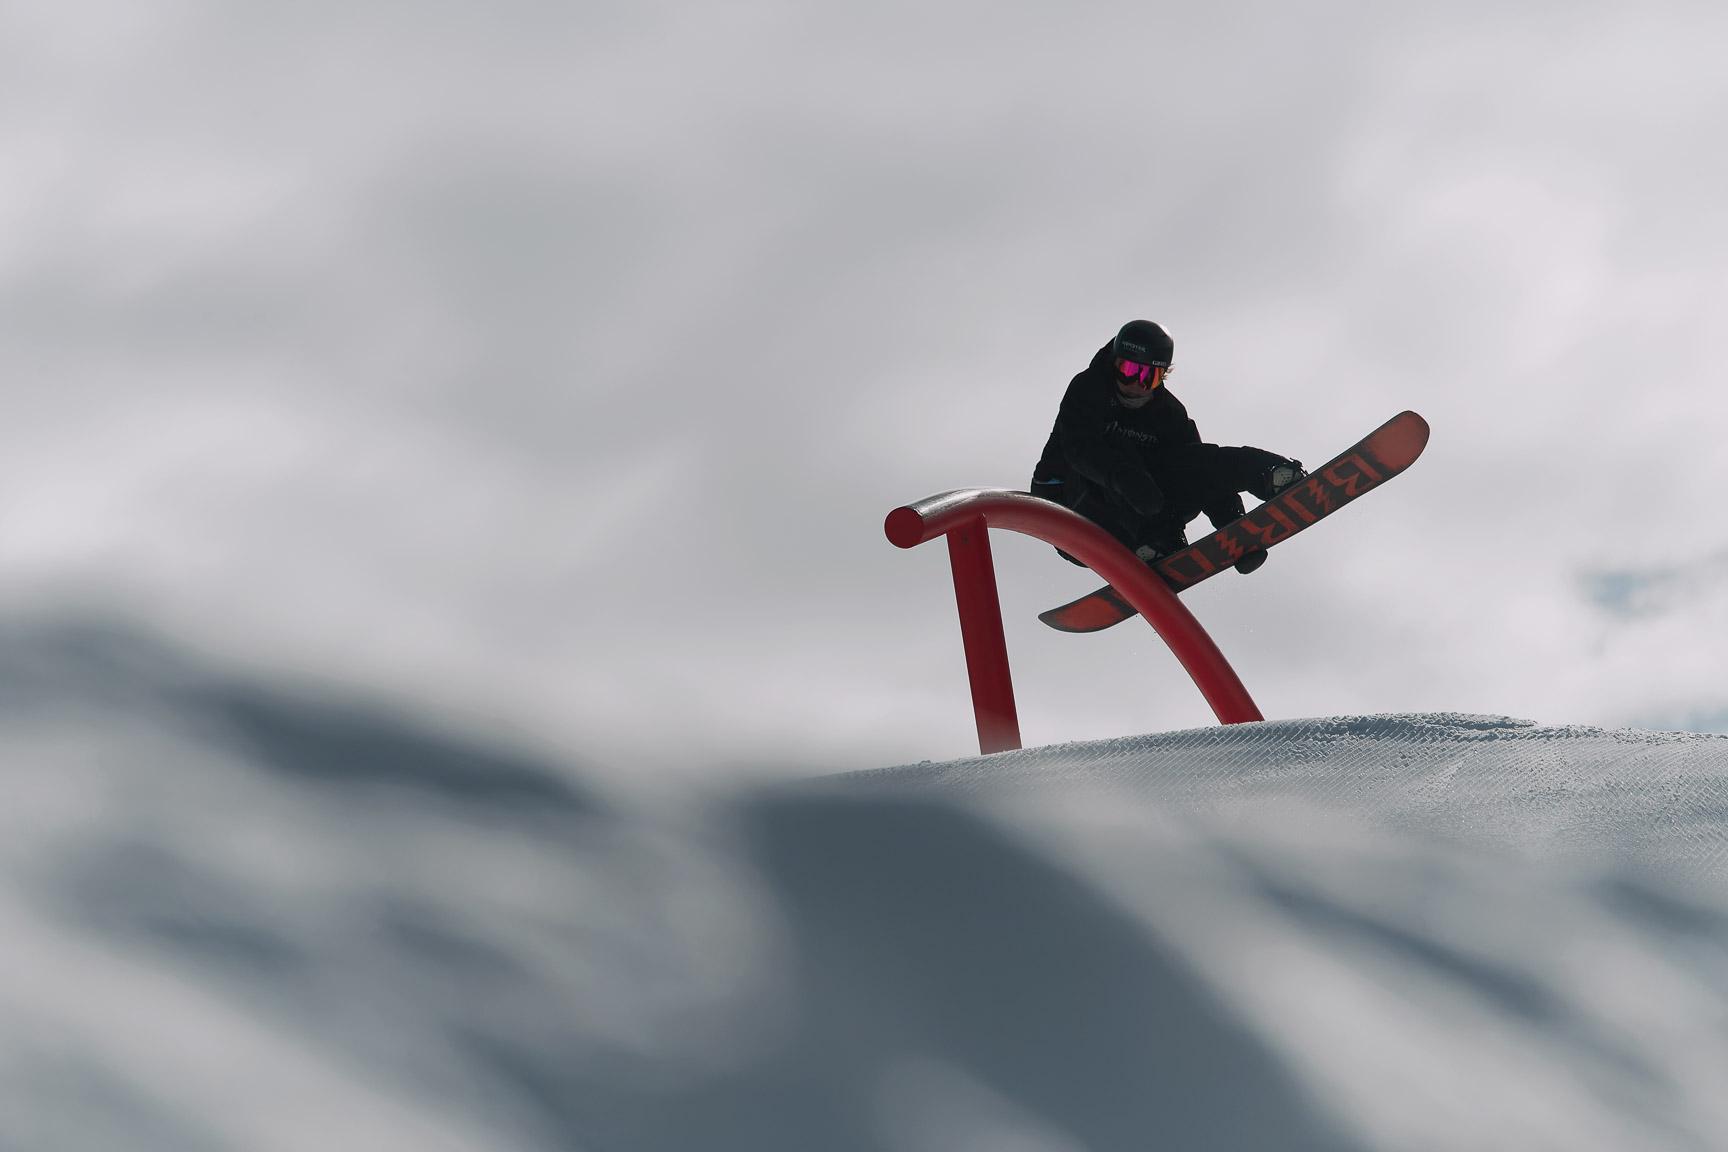 Darcy Sharpe, Snowboard Rail Jam